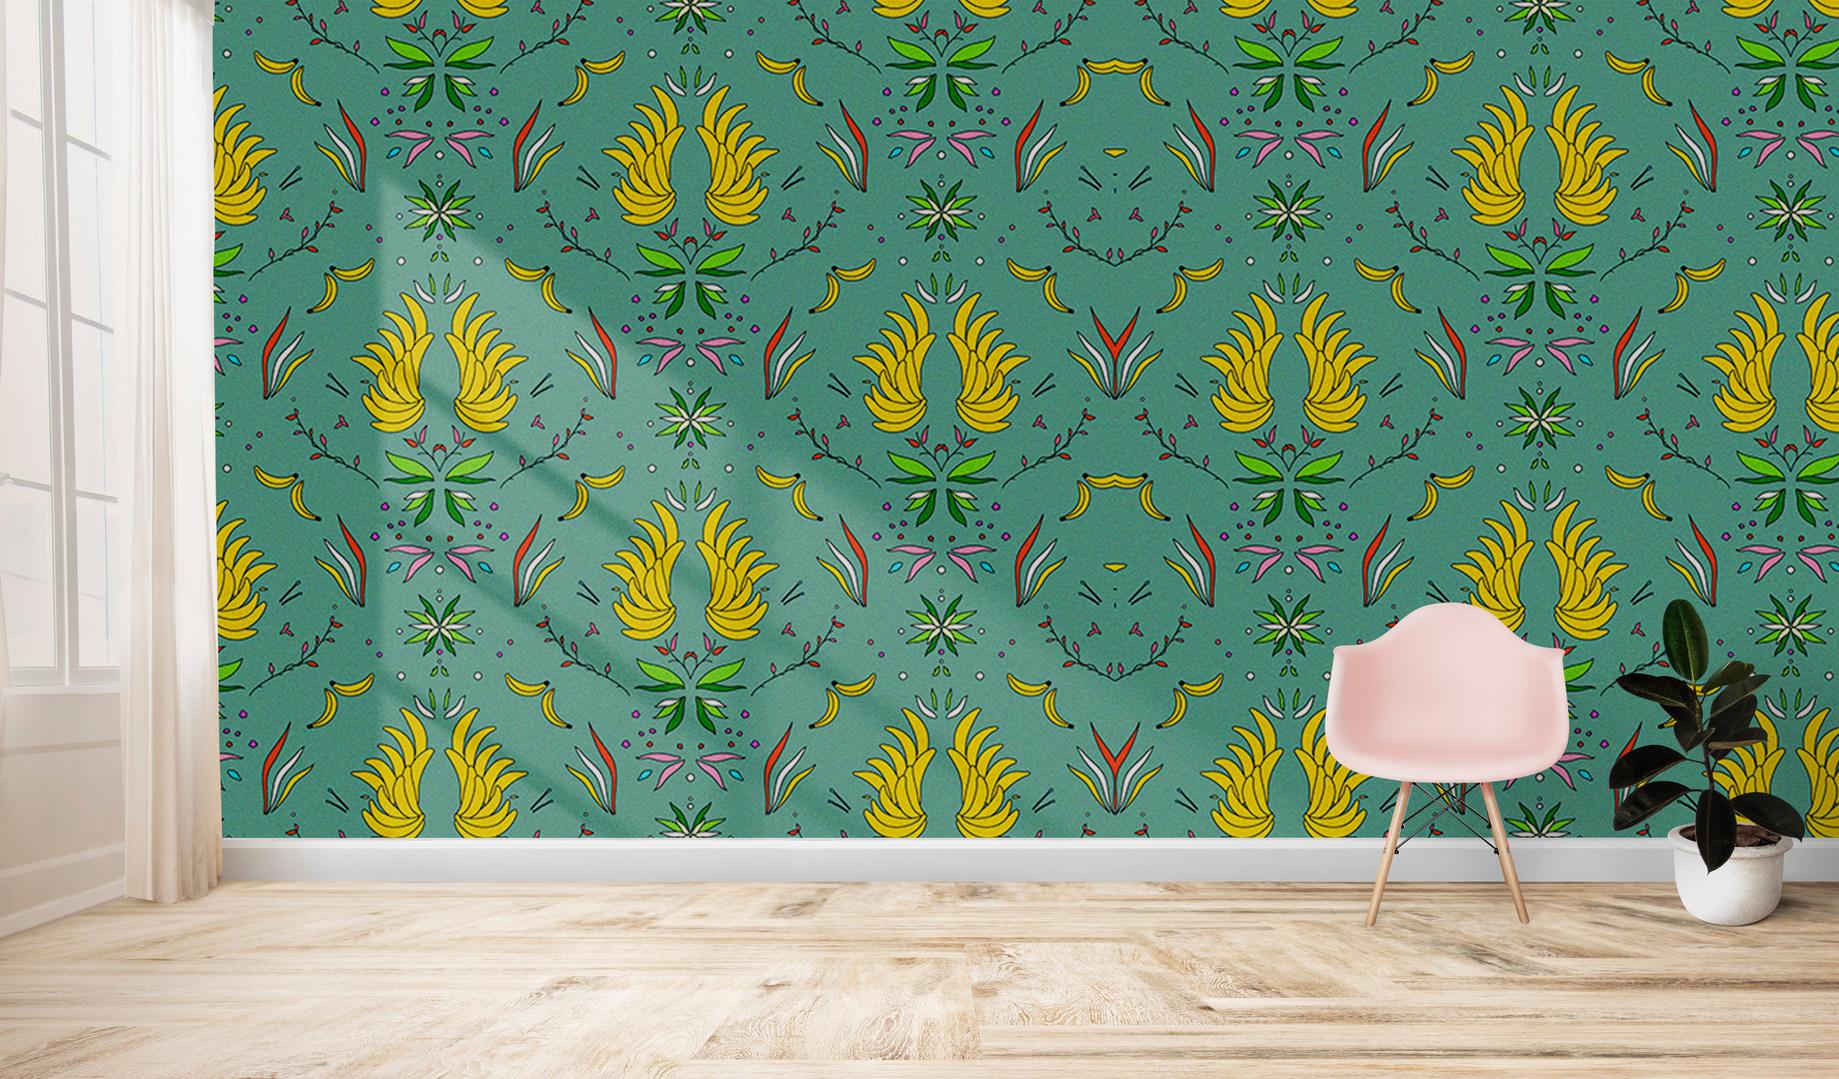 Heroniax_wallpaper 7.jpg